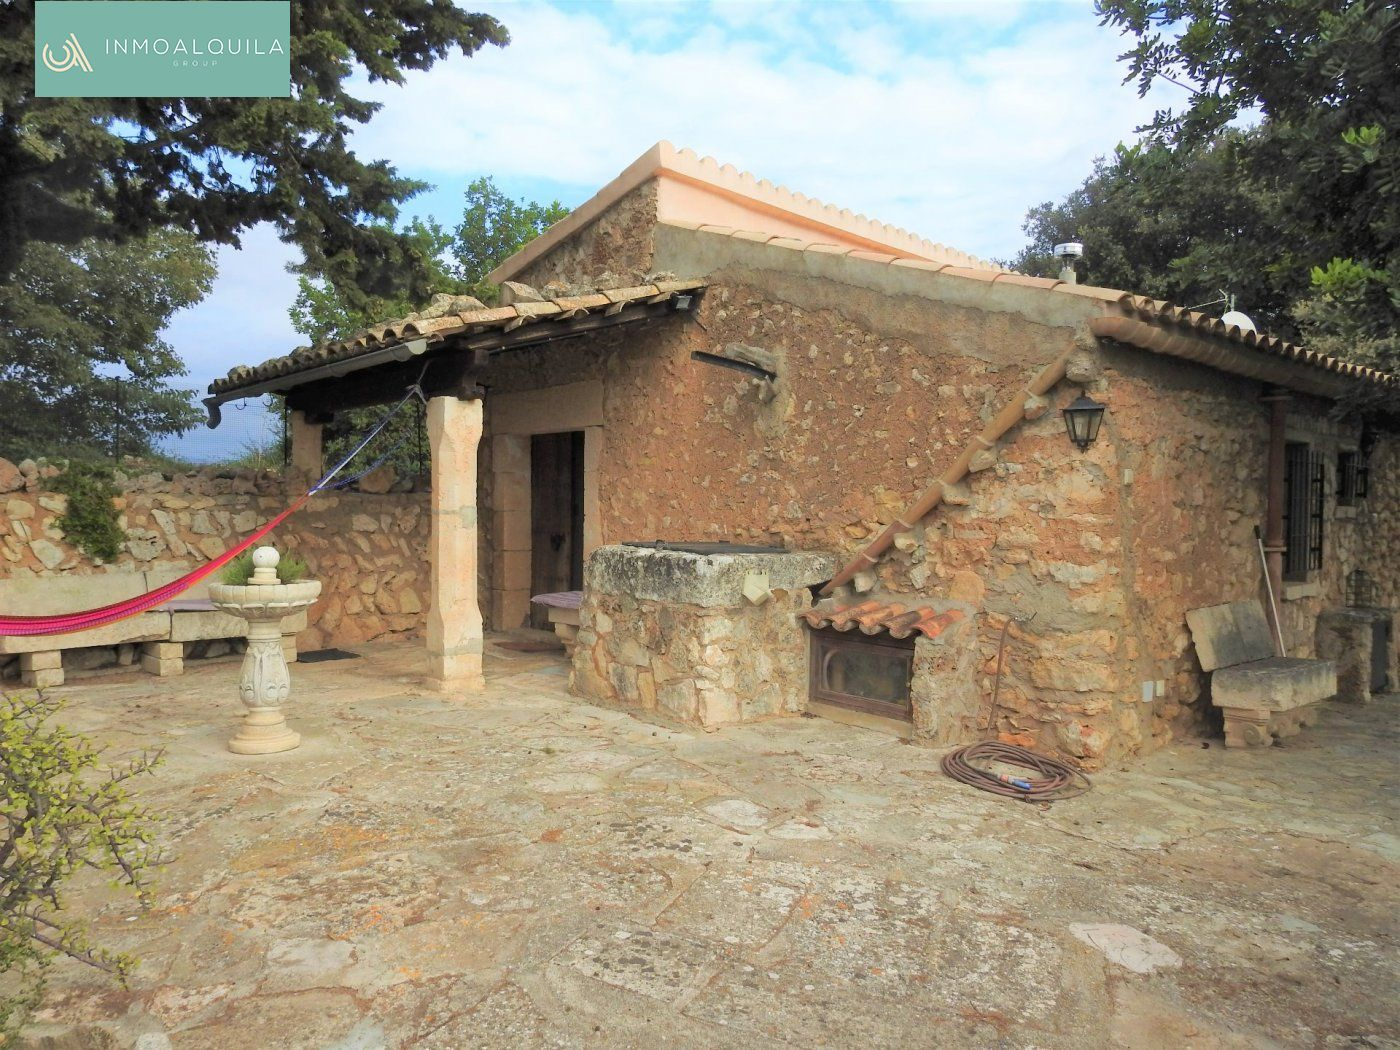 Location Maison  Llubí ,llubi. Se alquila bonita finca rustica en llubi. 2hab, 1baño, terraza,